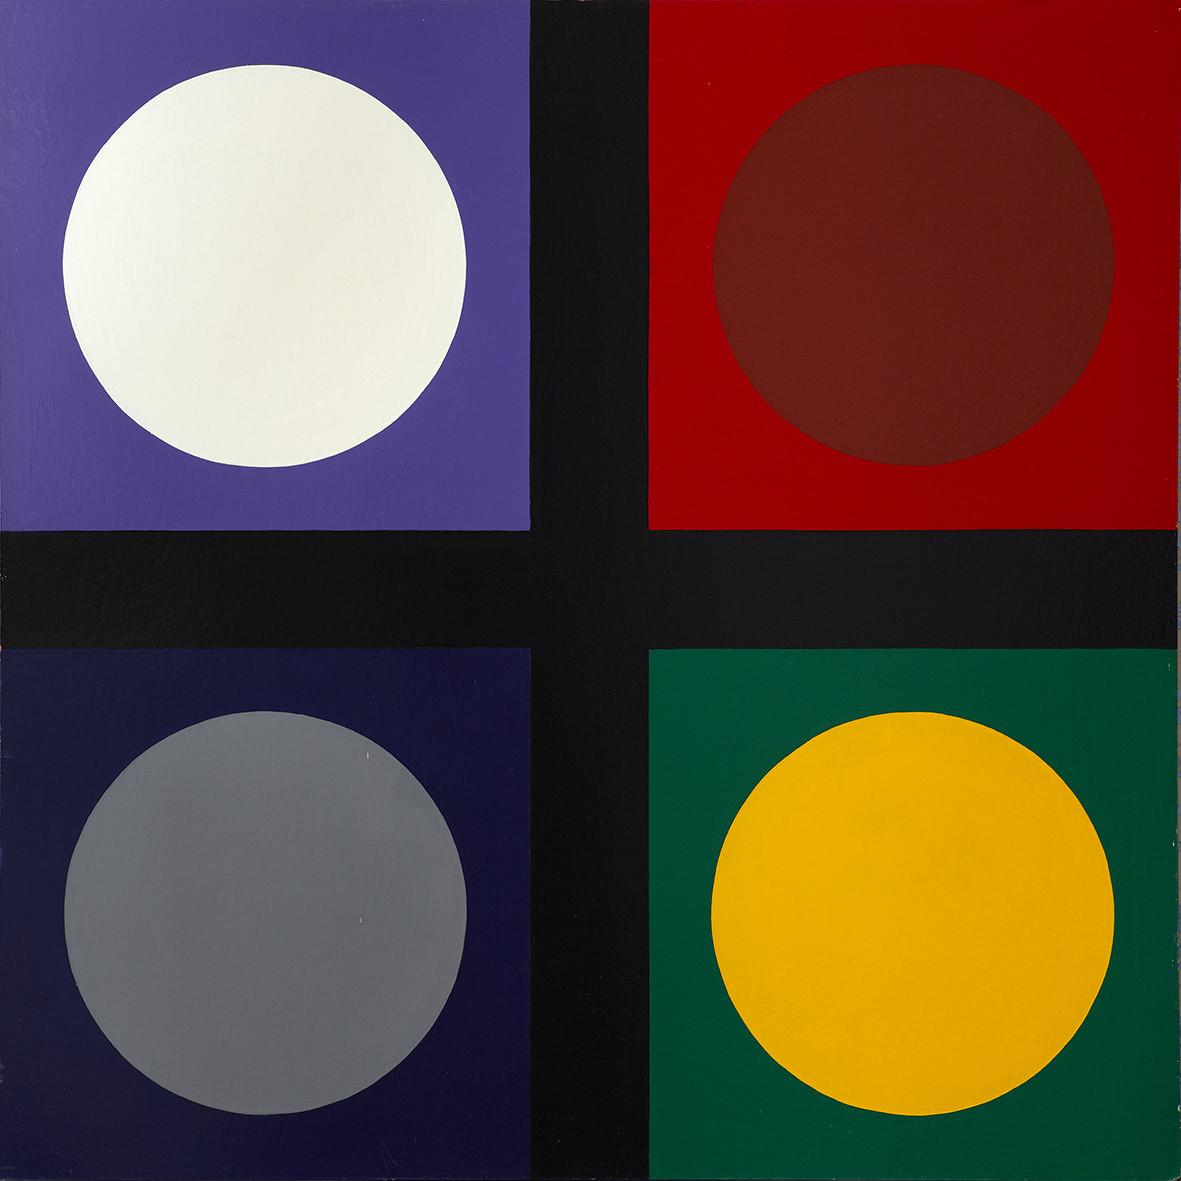 "<span class=""link fancybox-details-link""><a href=""/exhibitions/143/works/artworks11008/"">View Detail Page</a></span><div class=""artist""><strong> Poul Gernes</strong></div><div class=""title""><em>Untitled (tic tac toe painting)</em>, 1967</div><div class=""medium"">enamel paint on masonite</div><div class=""dimensions"">160.0 x 160.0 cm<br>62 15/16 x 62 15/16 in</div>"